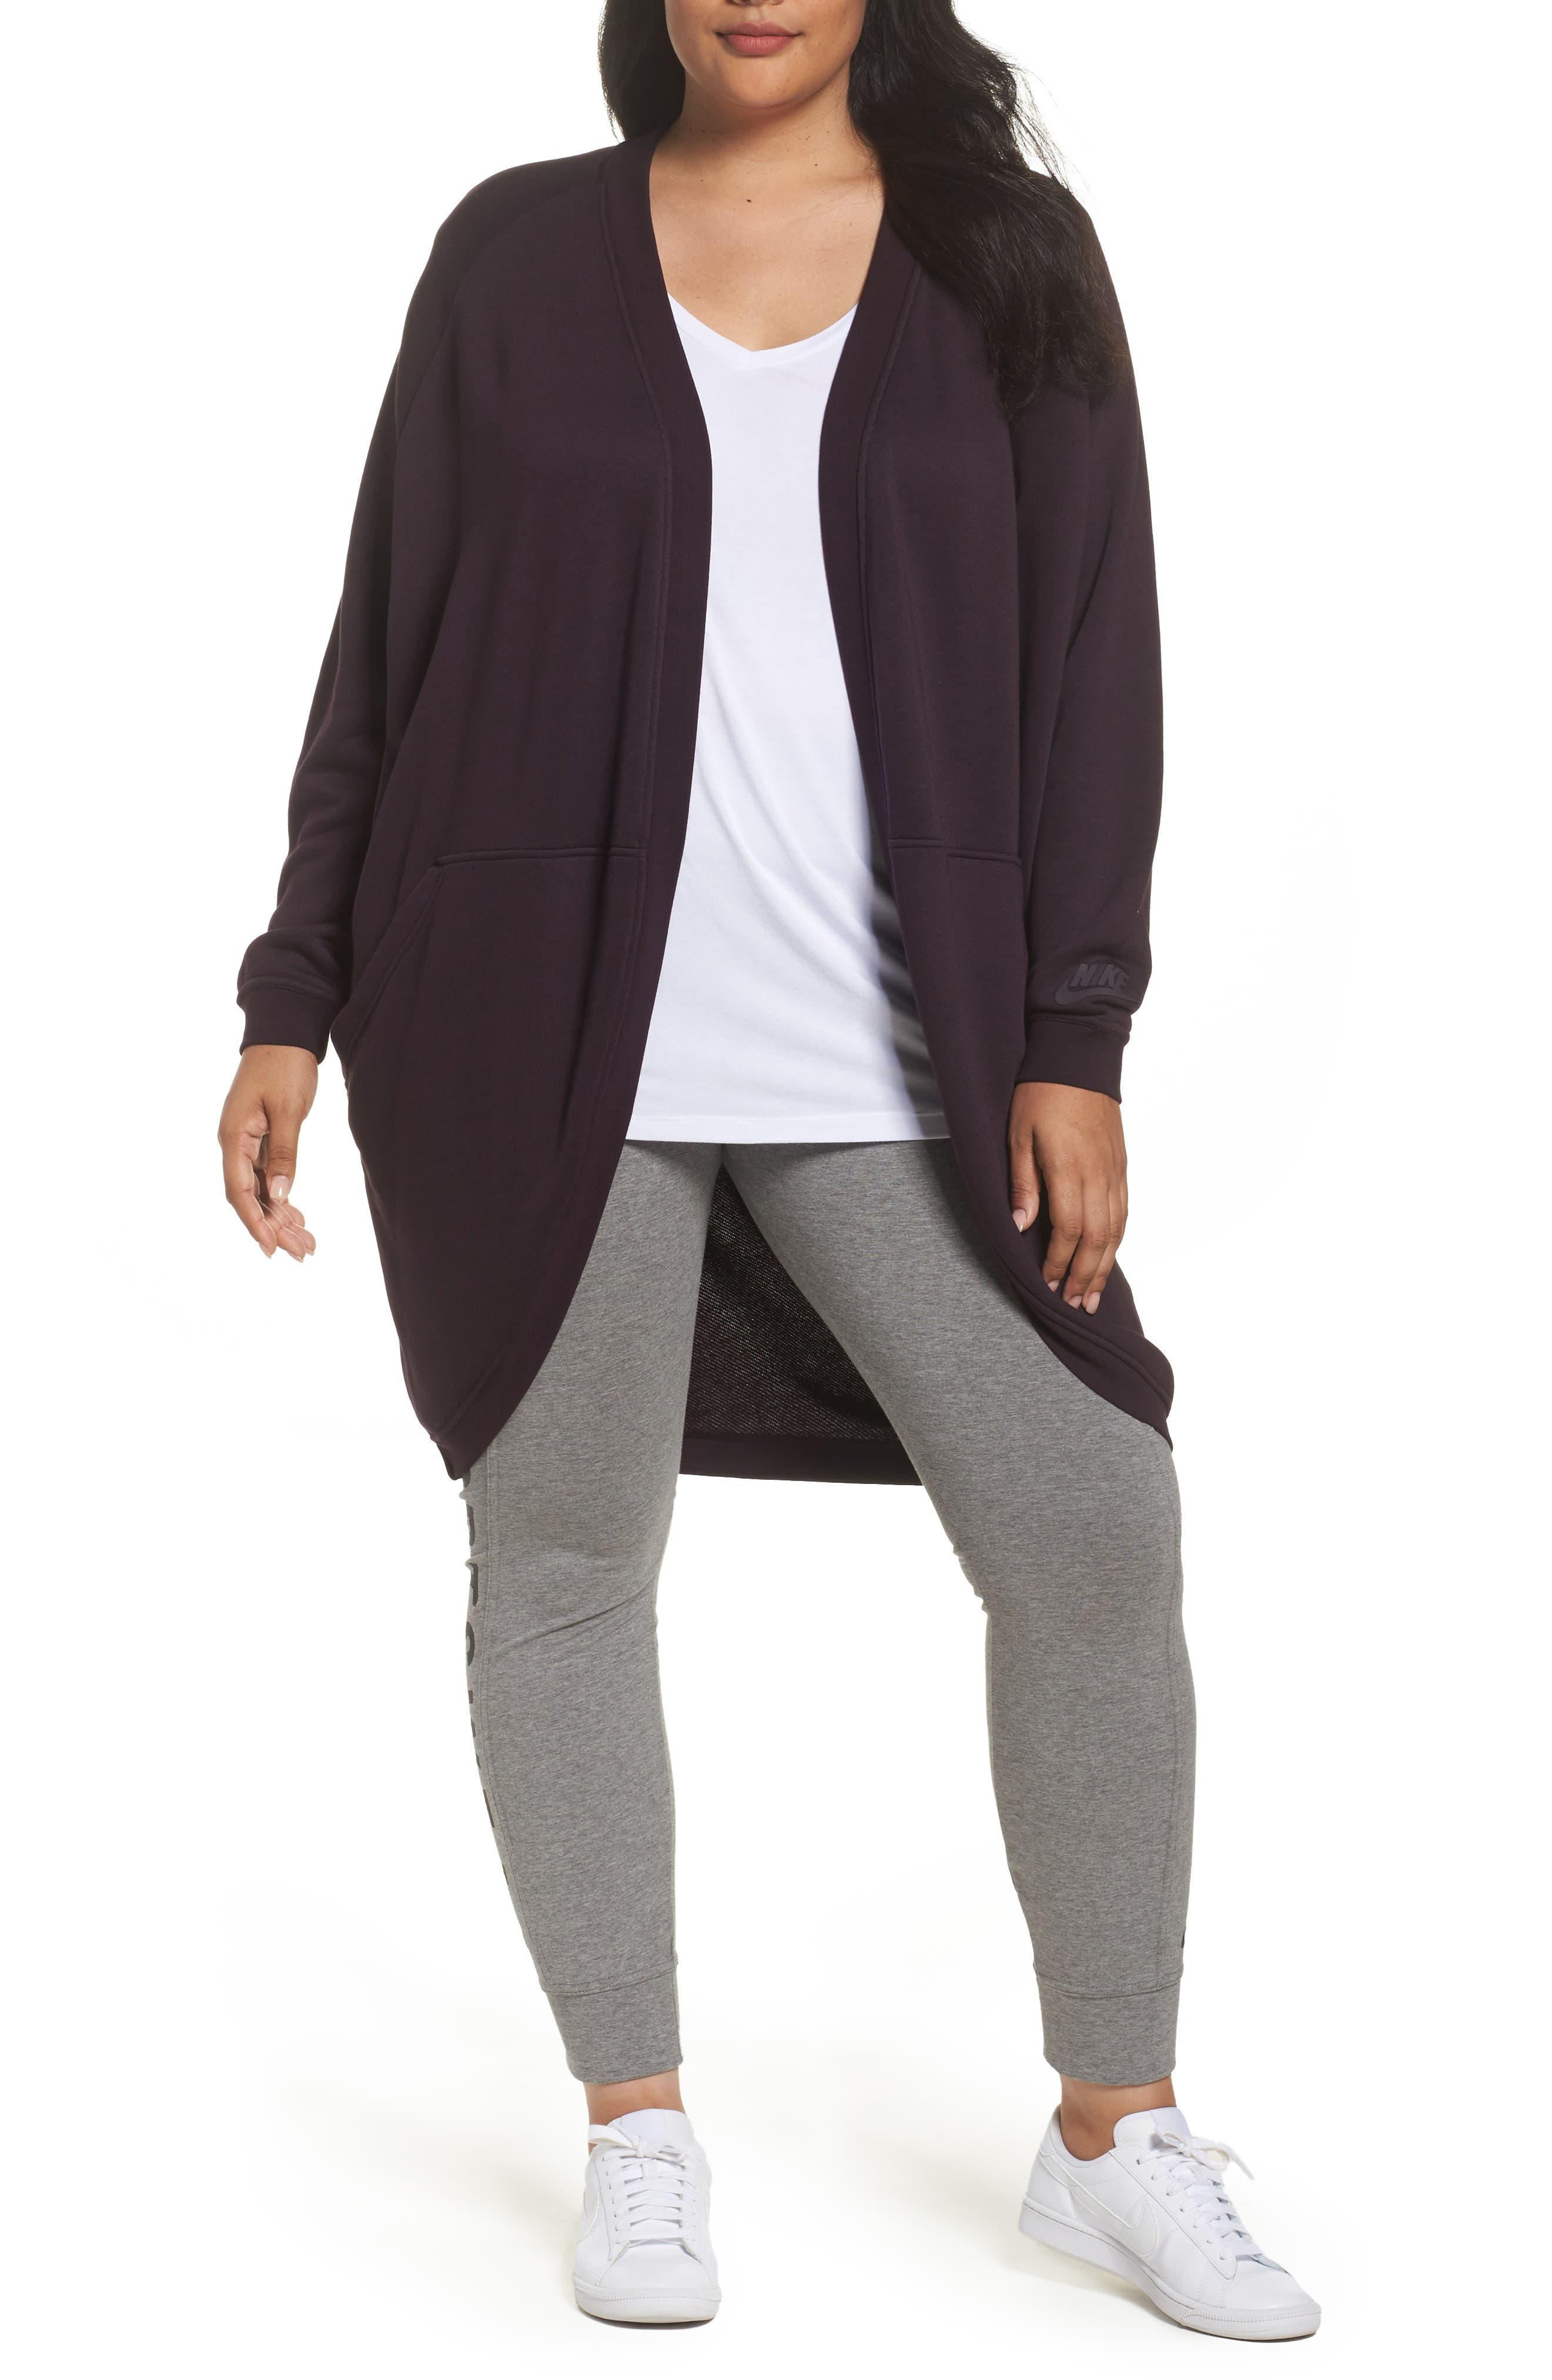 Sportswear Modern Cardigan,                             Main thumbnail 1, color,                             Port Wine/ Port Wine